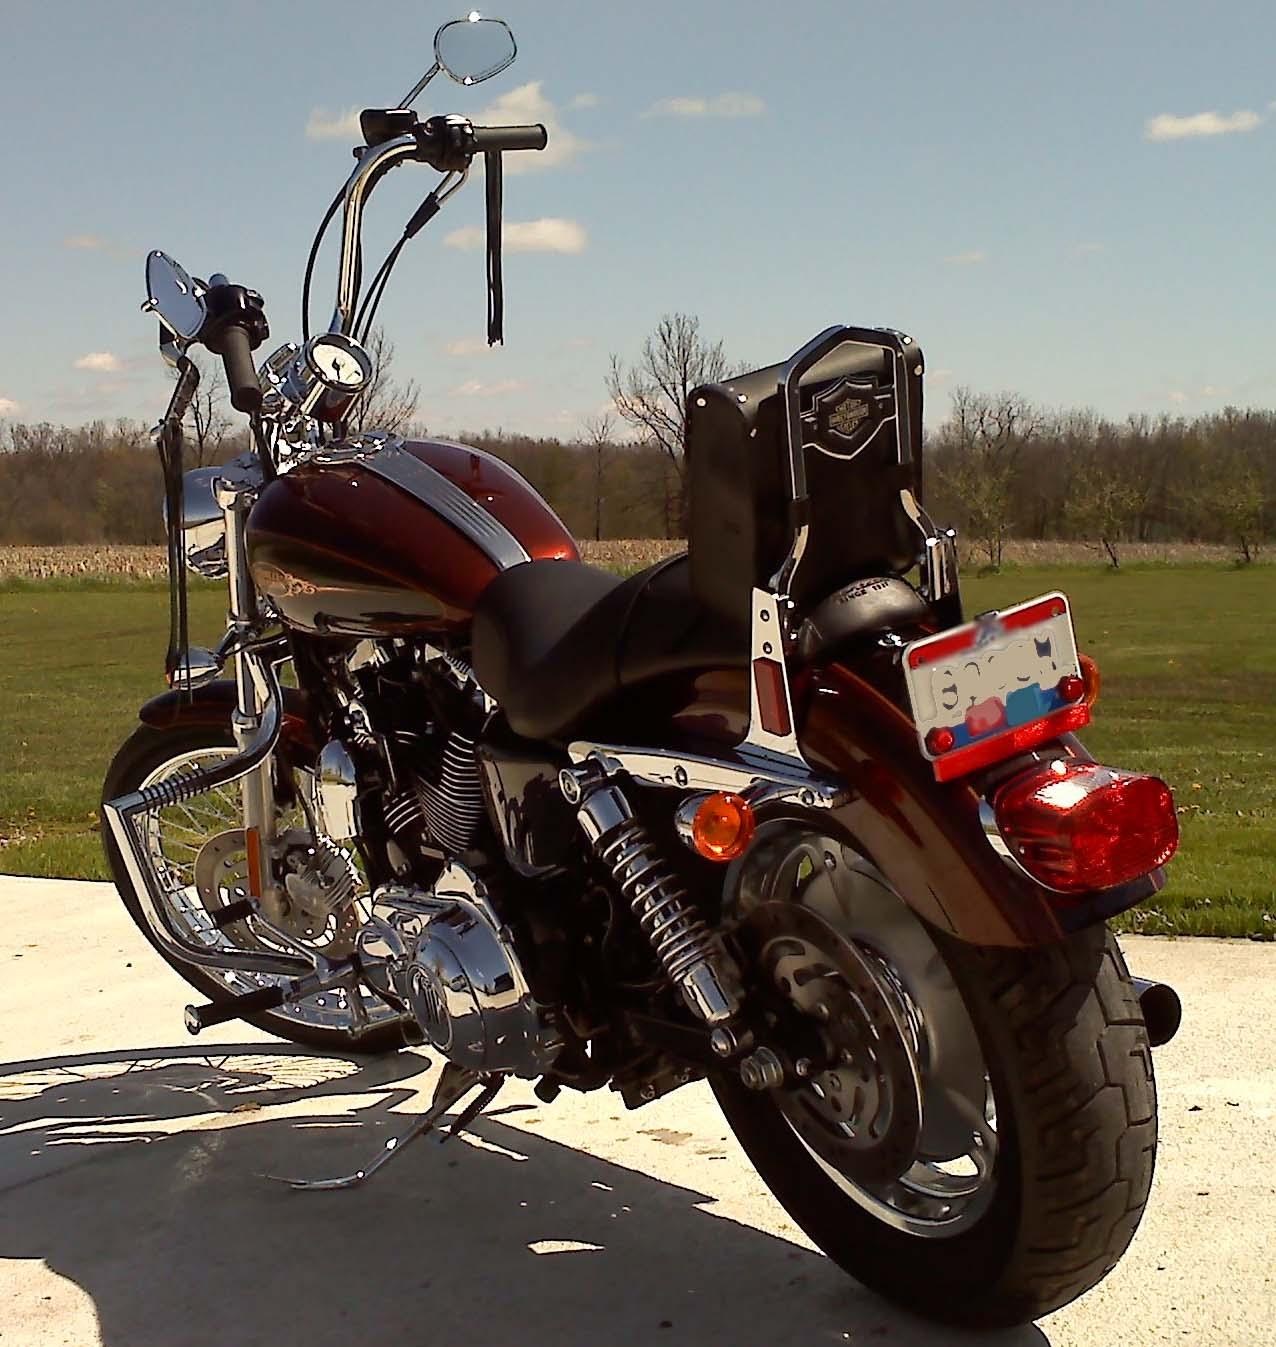 Best motorcycle handlebars - 2009 1200c Harley Davidson Sportster W Mini Ape Handlebars